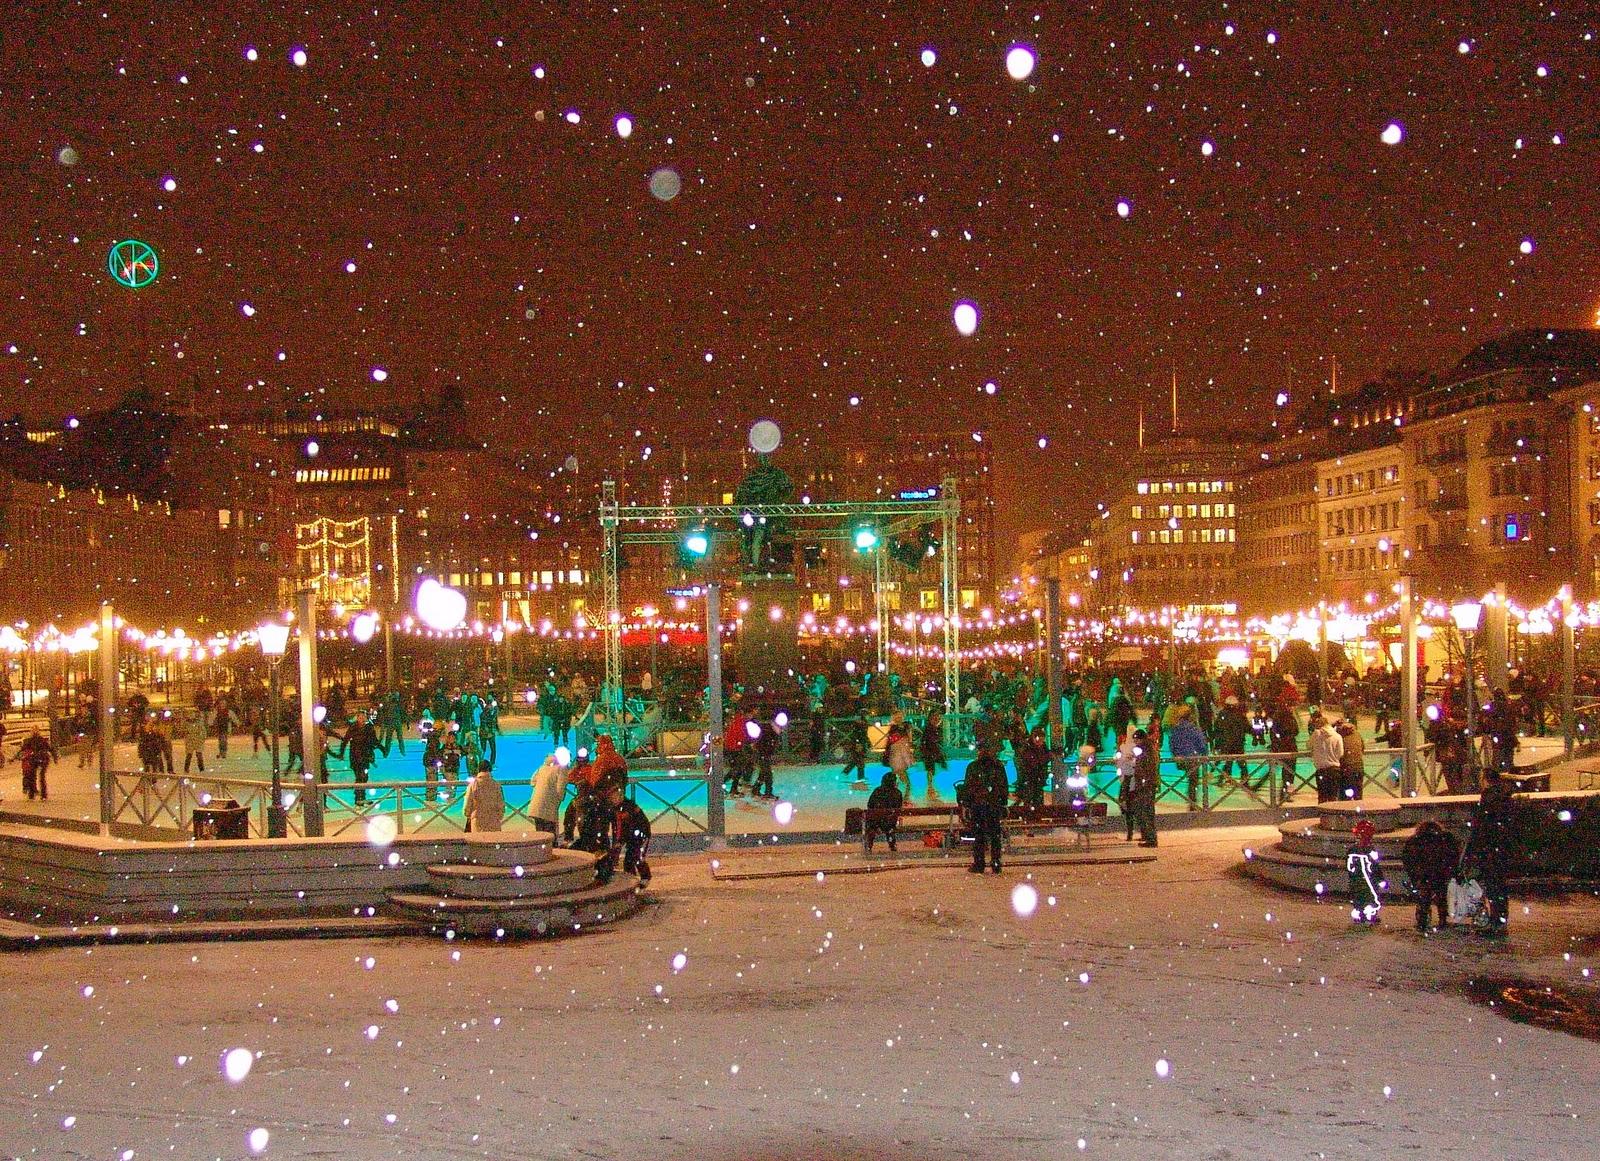 The Stockholm Tourist Winter Activities 2012